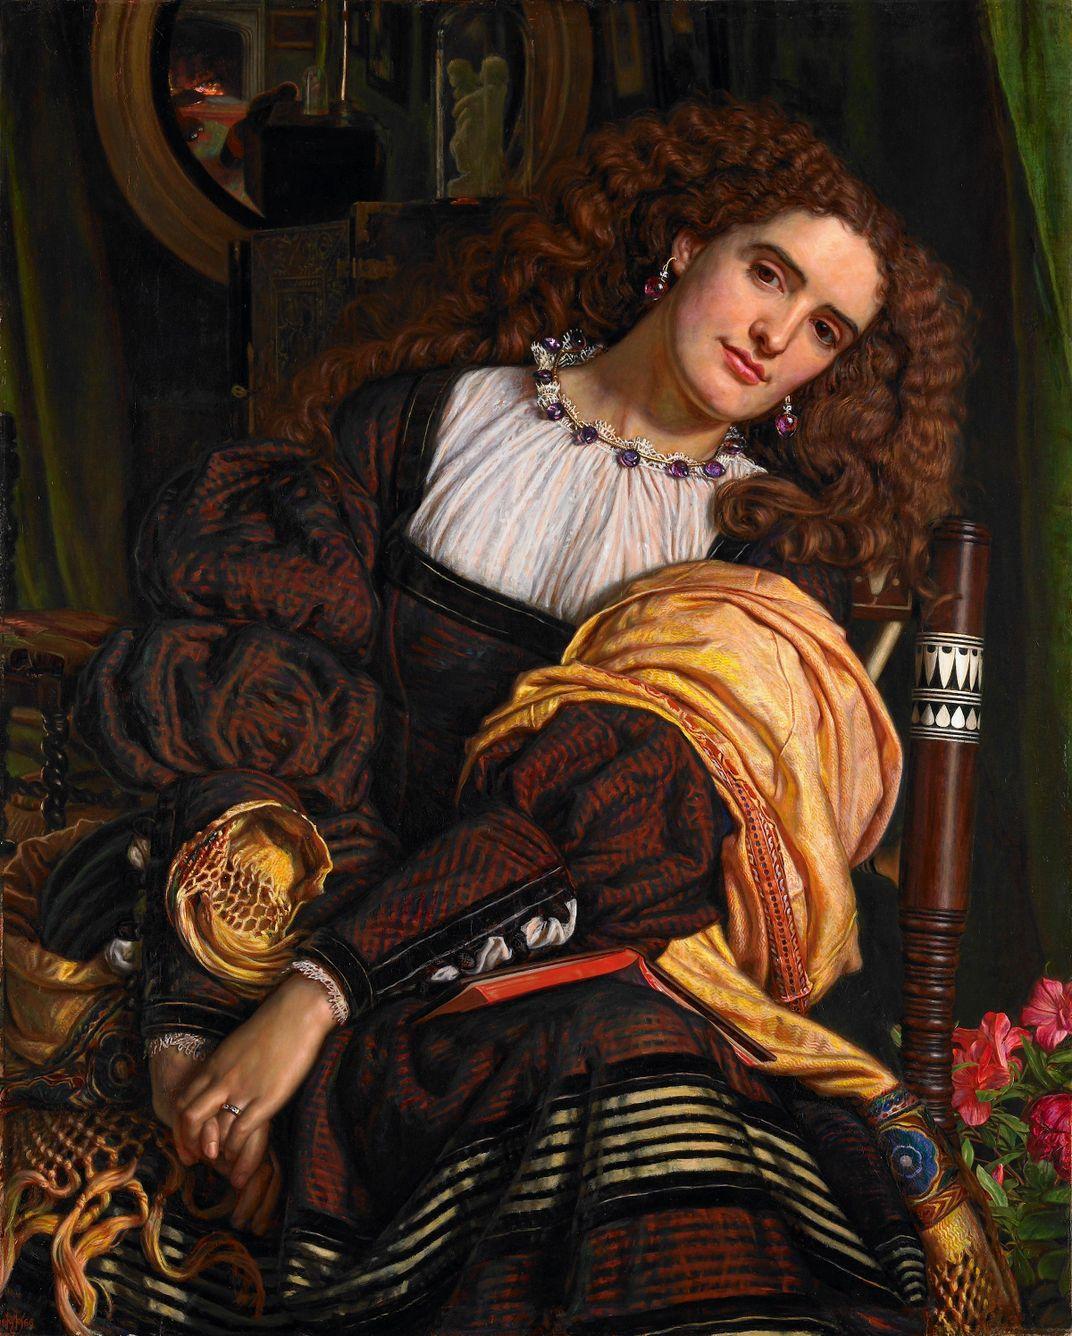 The Women Behind the Pre-Raphaelite Brotherhood